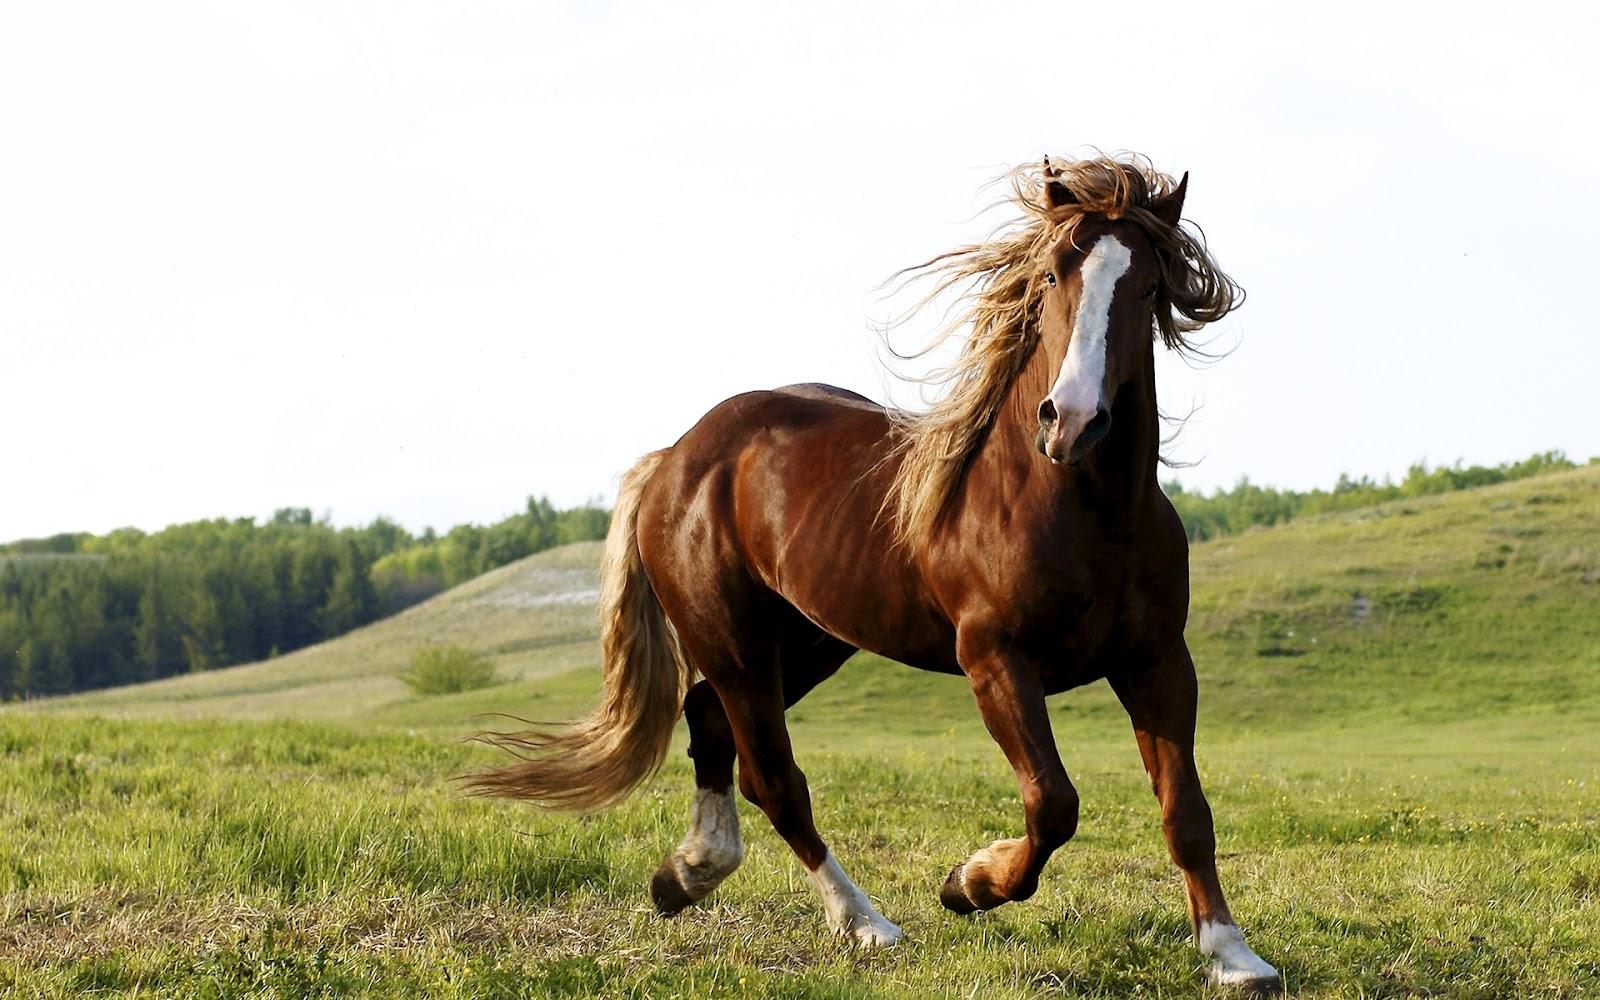 Fotos de caballos corriendo – I